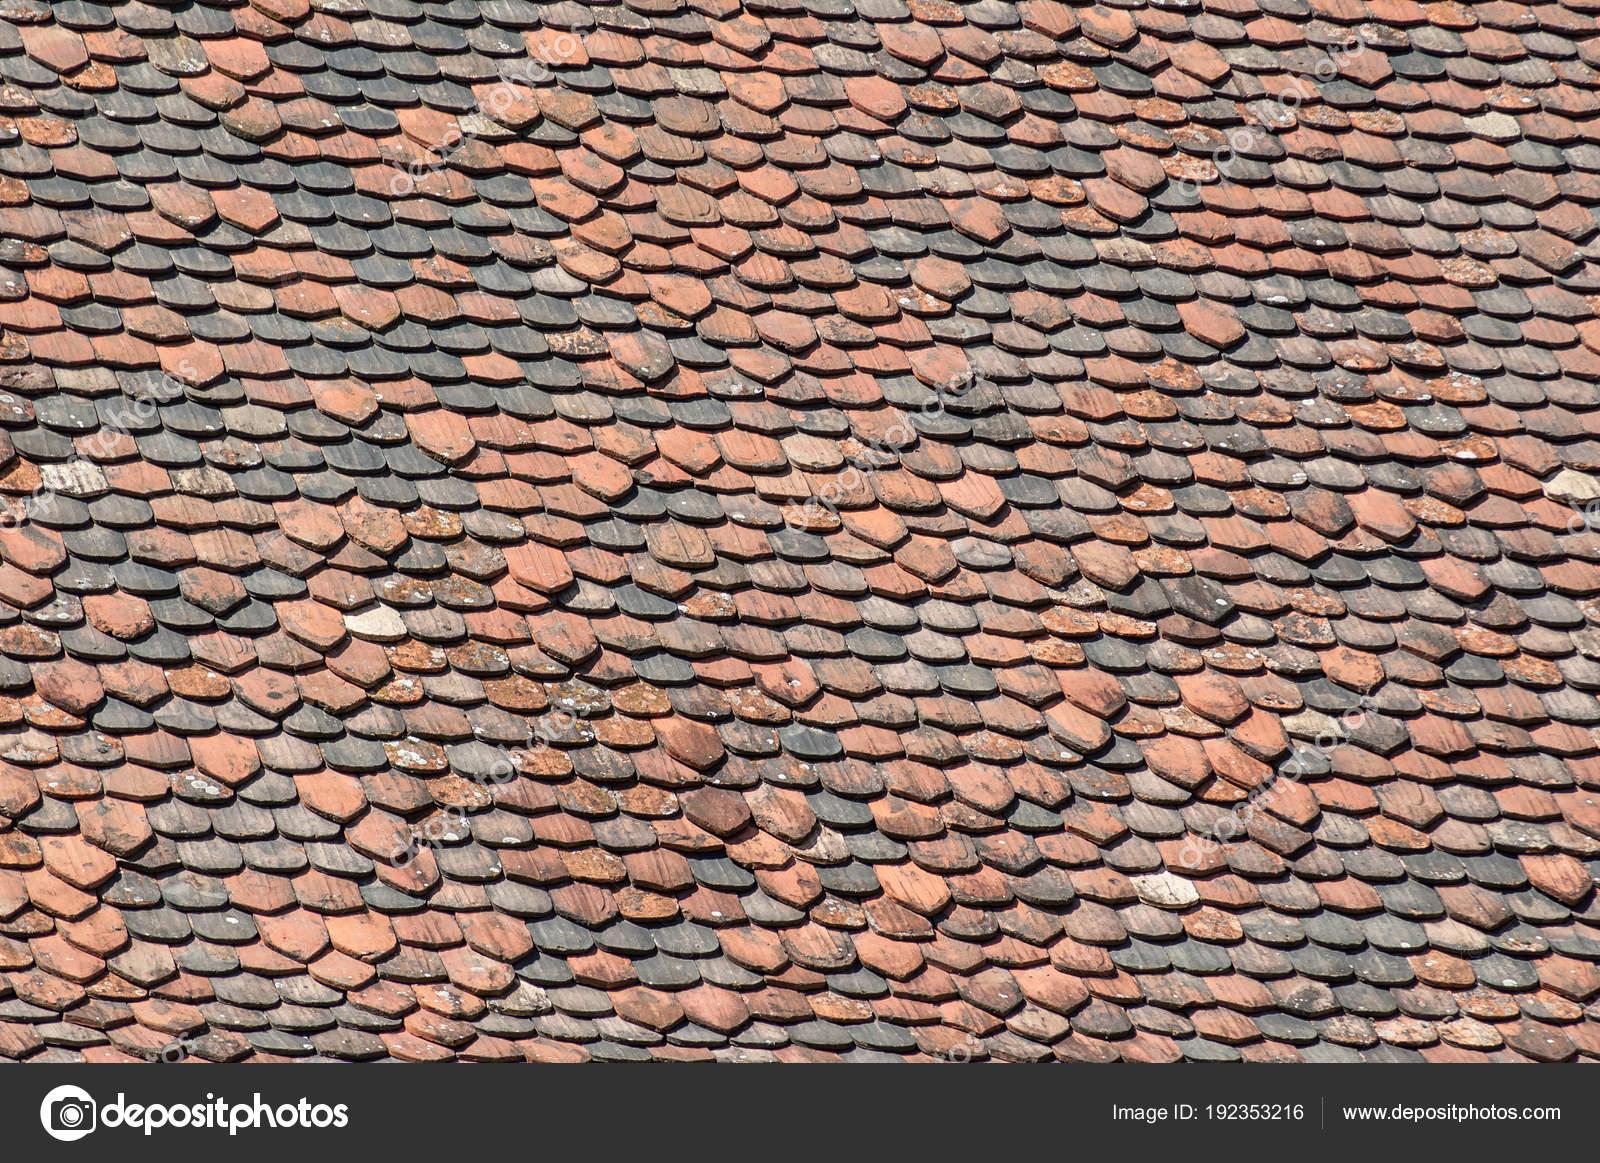 Terra cotta roof tiles texture — Stock Photo © NeydtStock #192353216